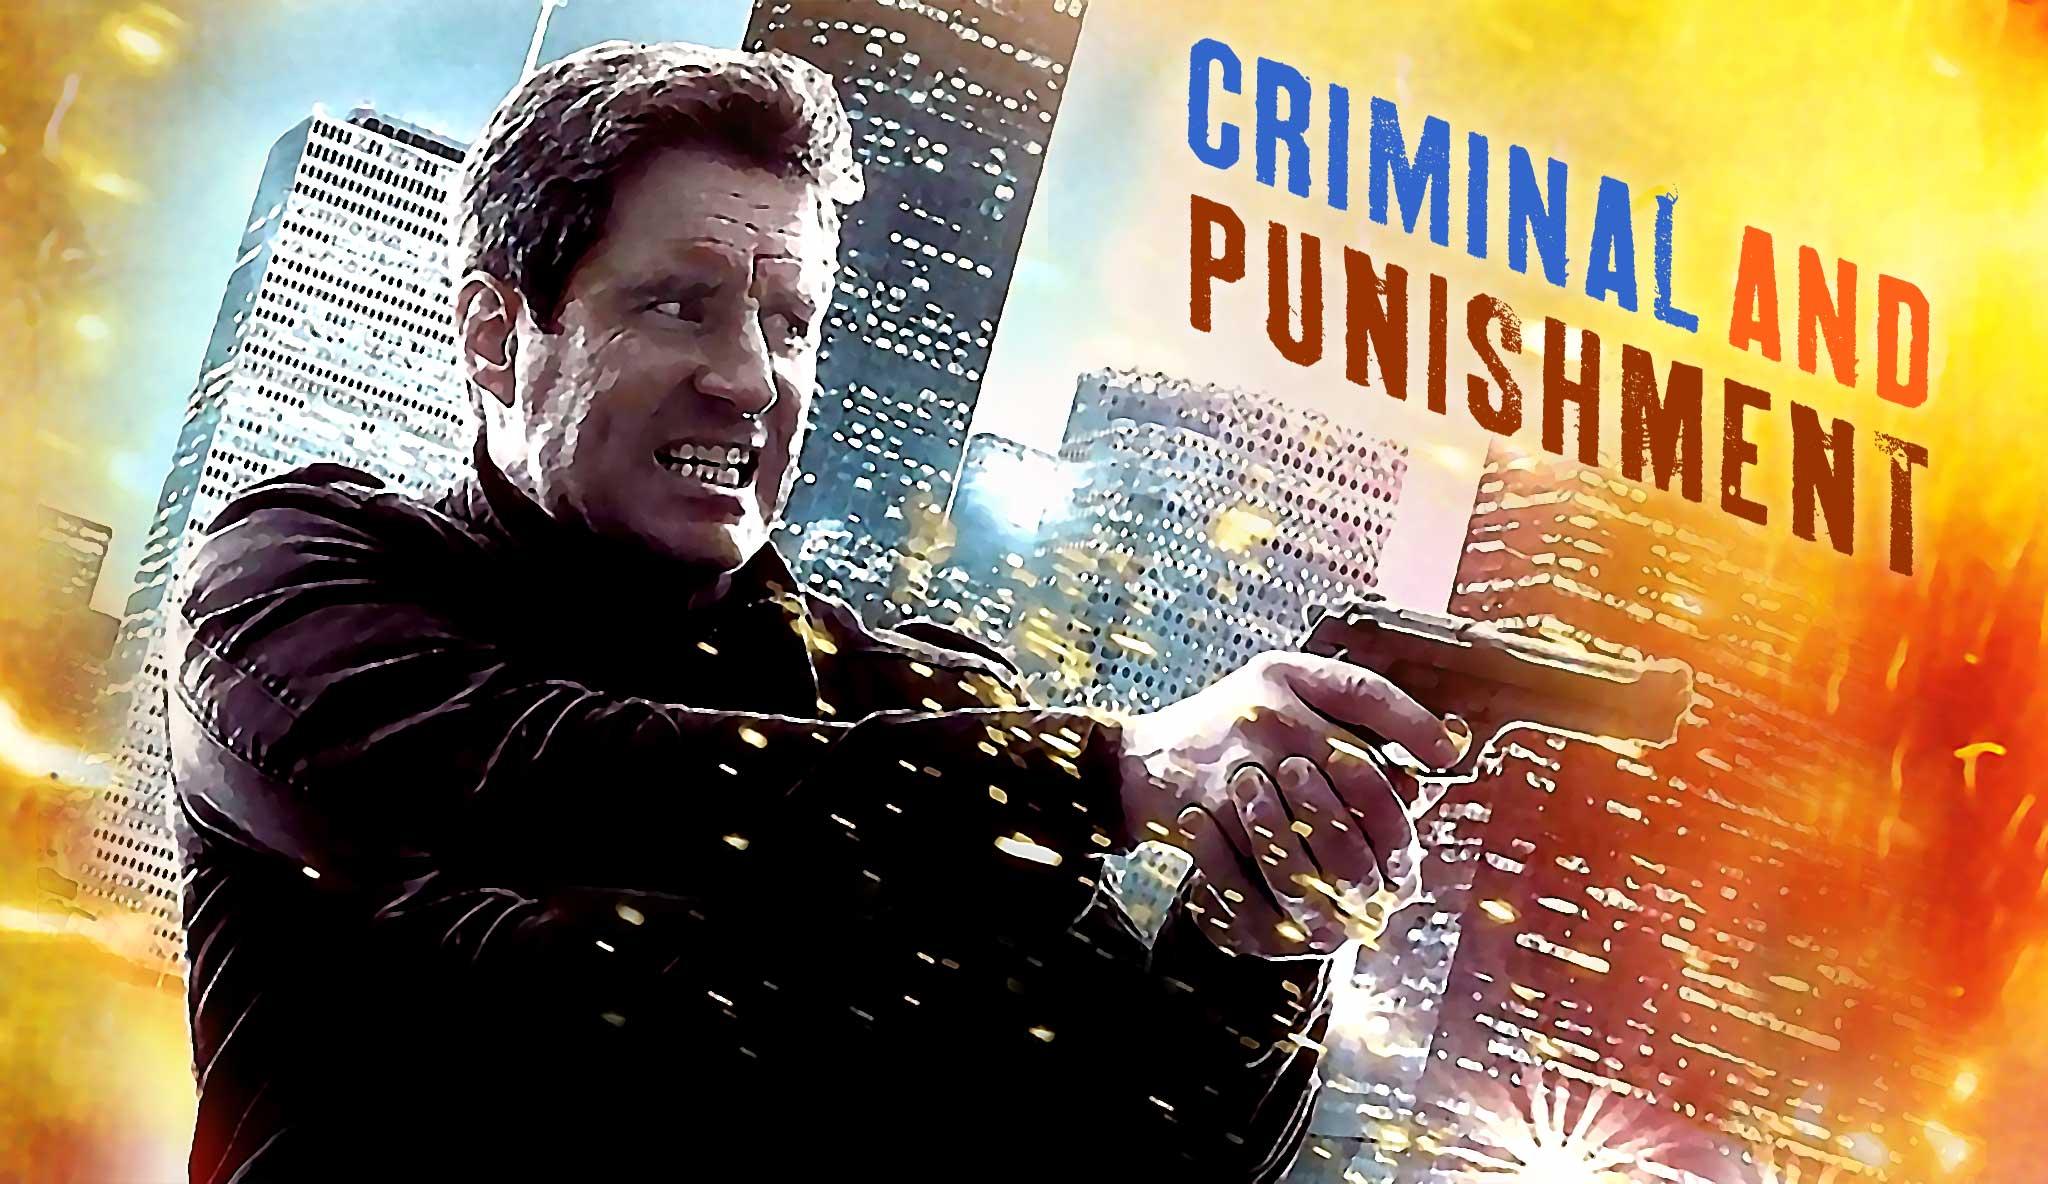 criminal-and-punishment-selbstjutiz\header.jpg